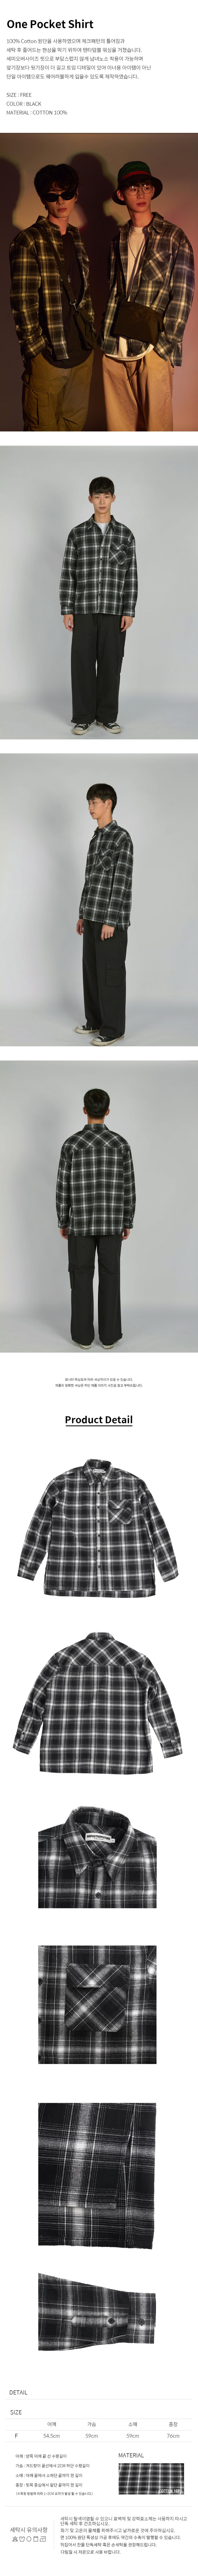 19FW 상세페이지 (블랙 셔츠).jpg